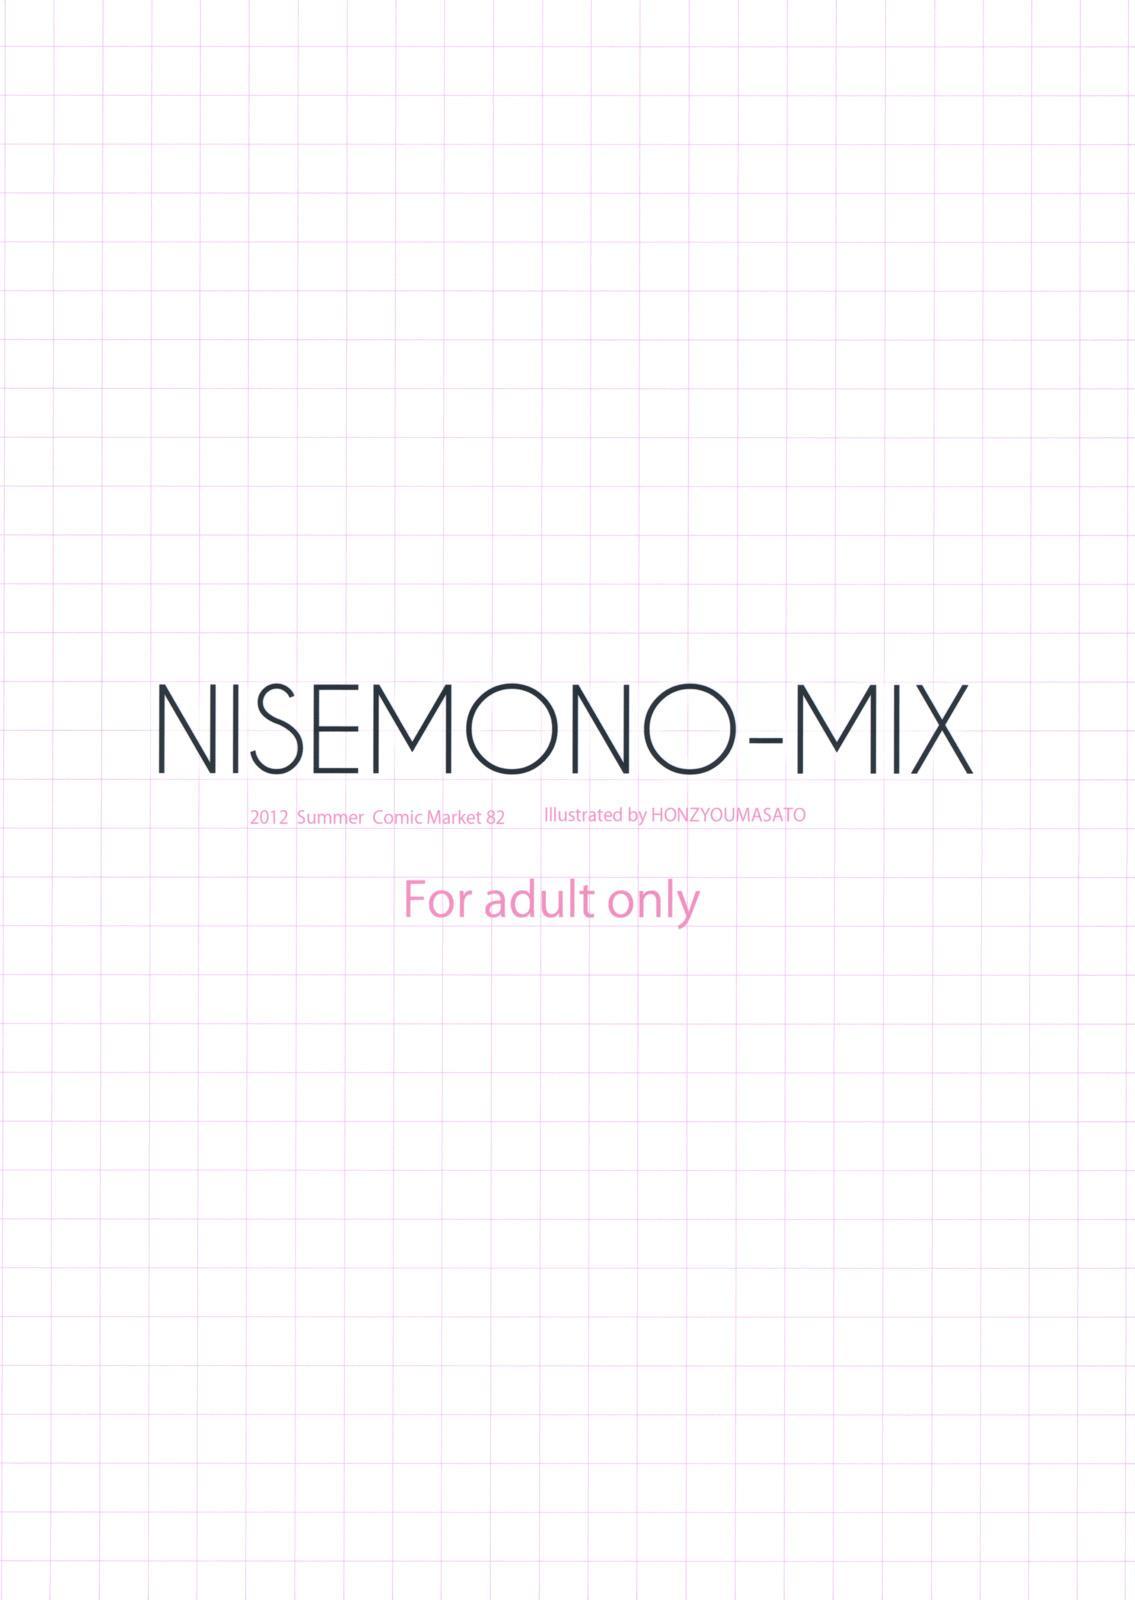 NISEMONO-MIX 21